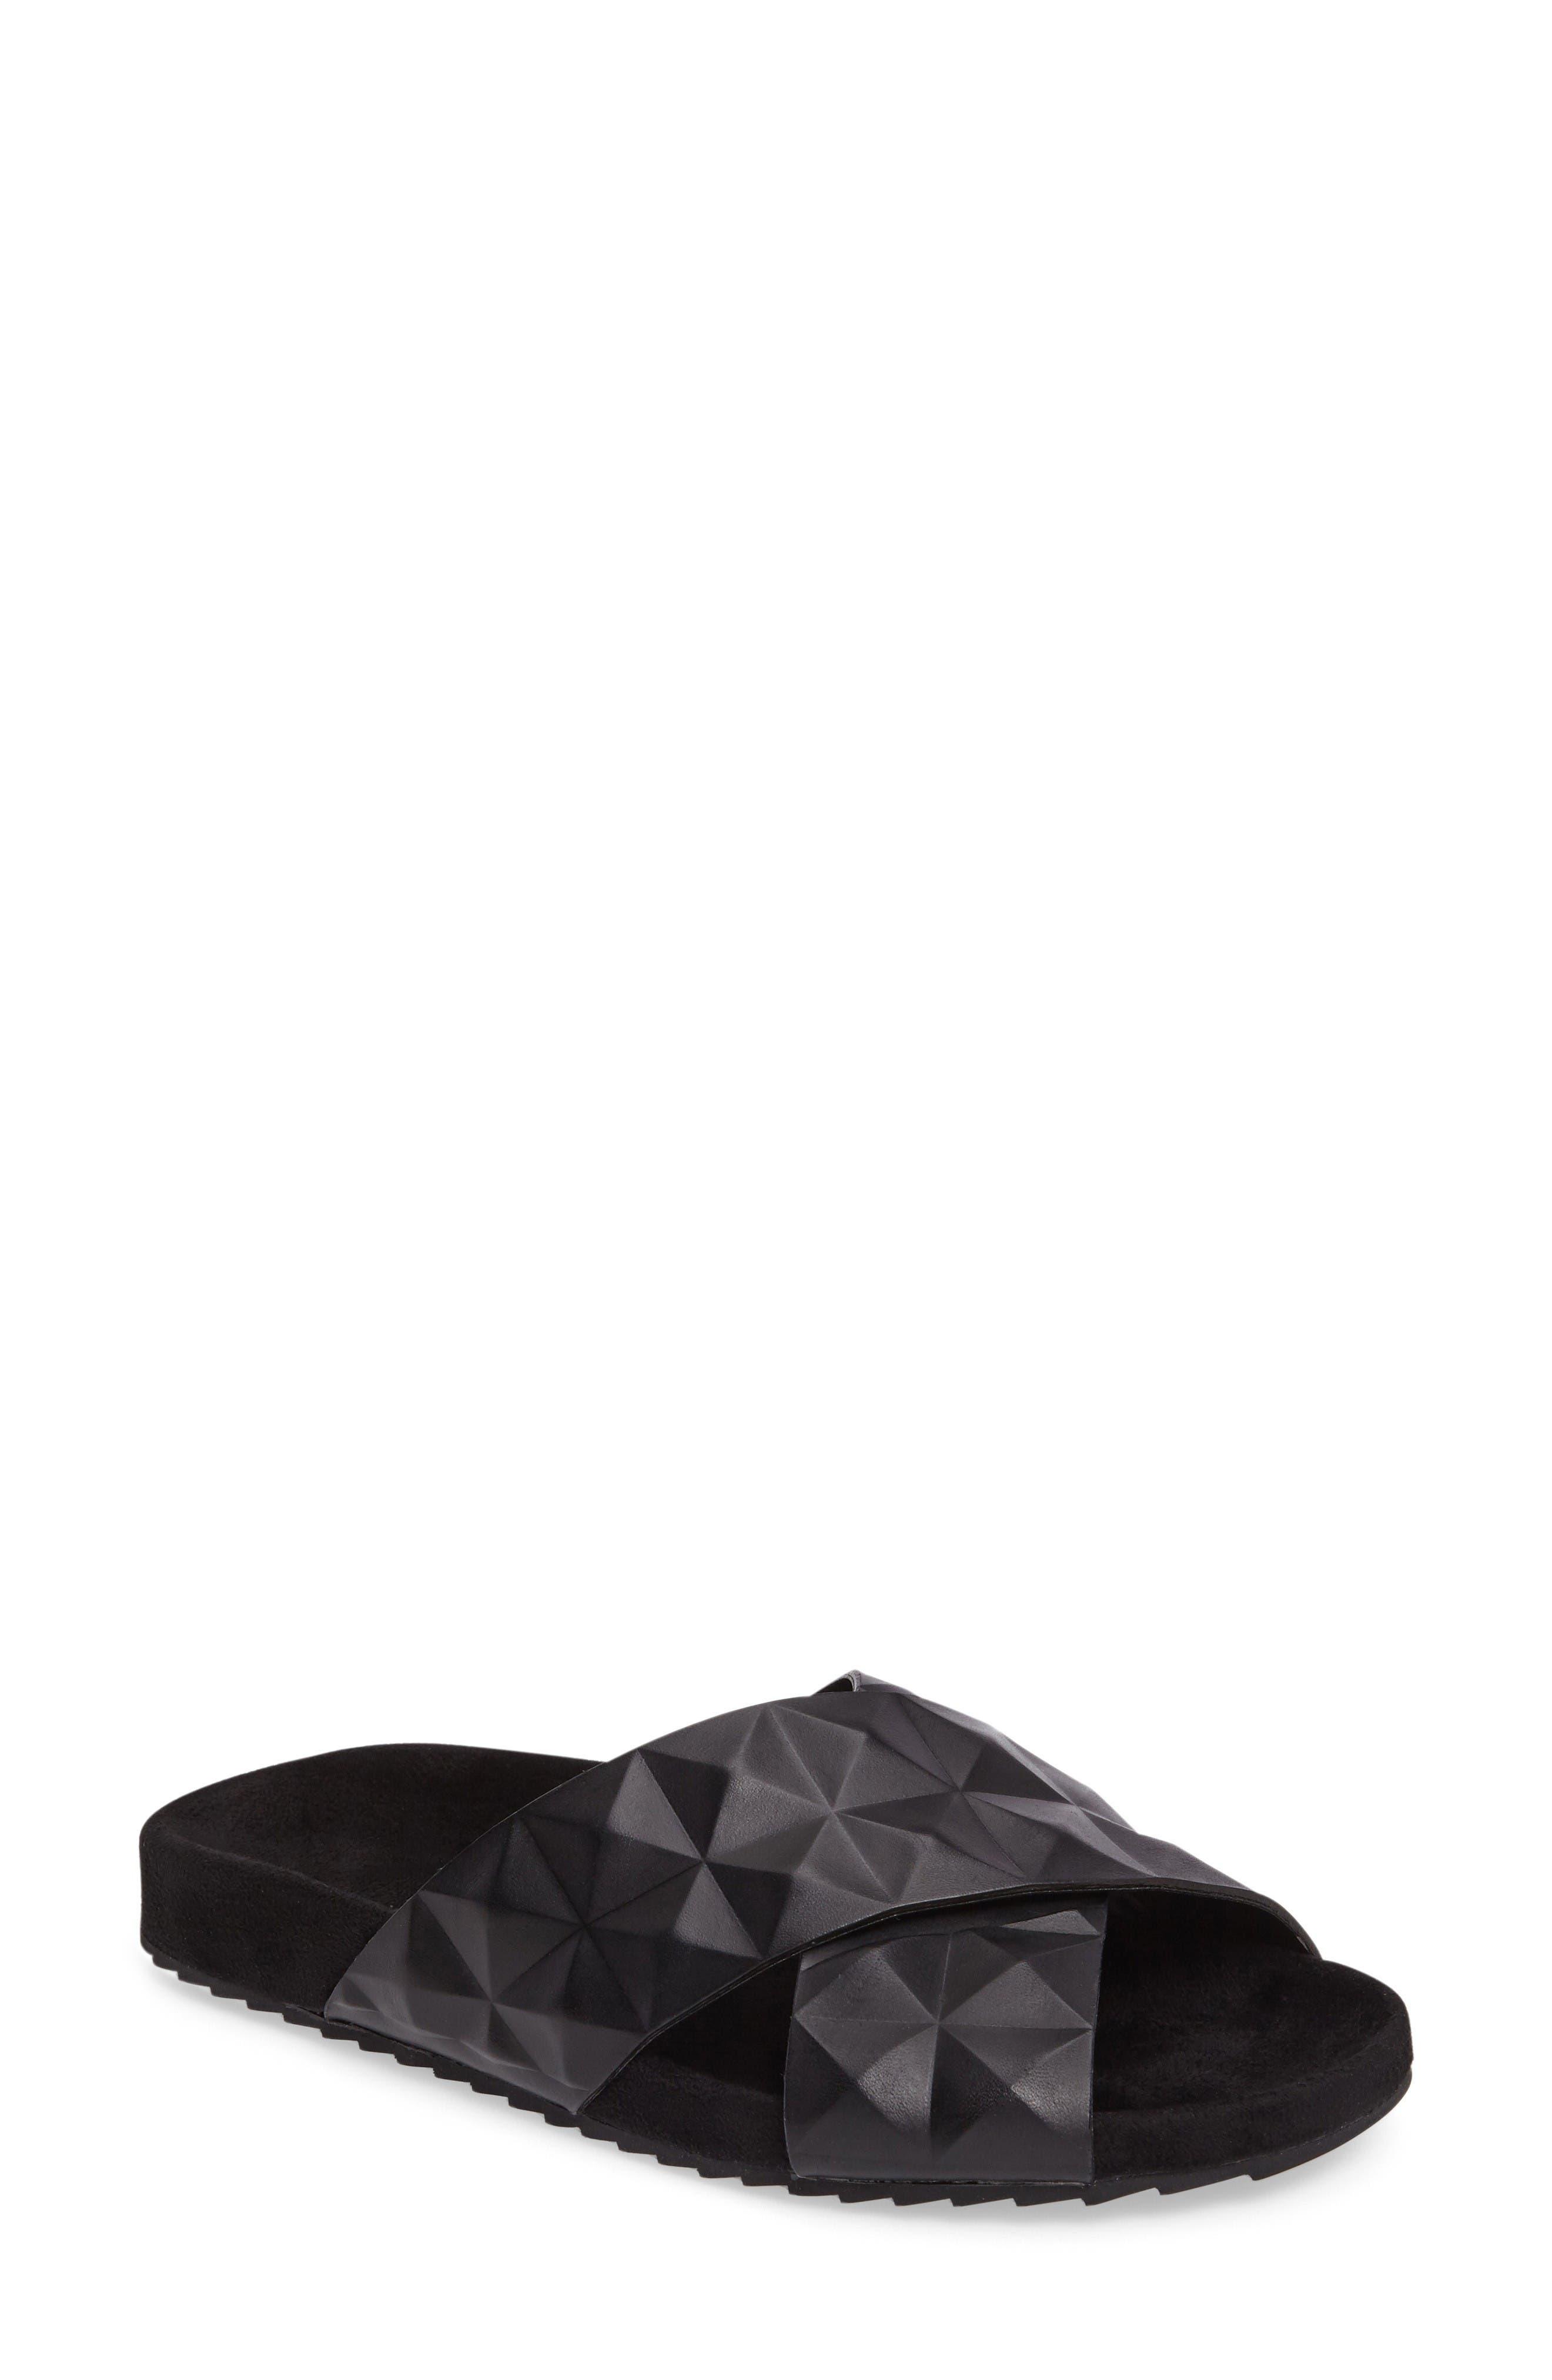 REBECCA MINKOFF Tammi Slide Sandal